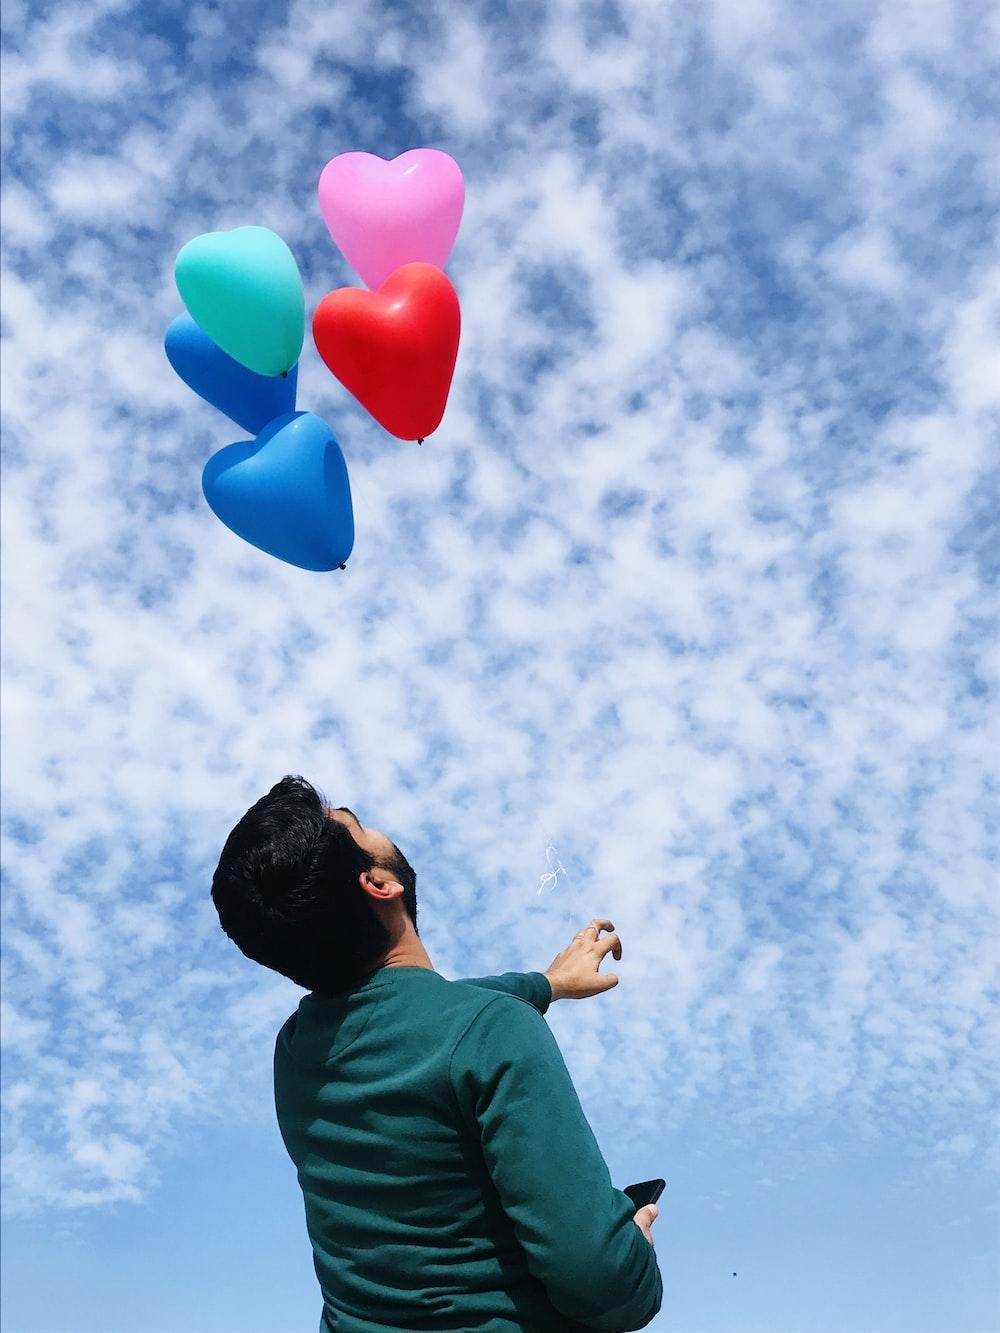 man in green shirt holding blue balloons